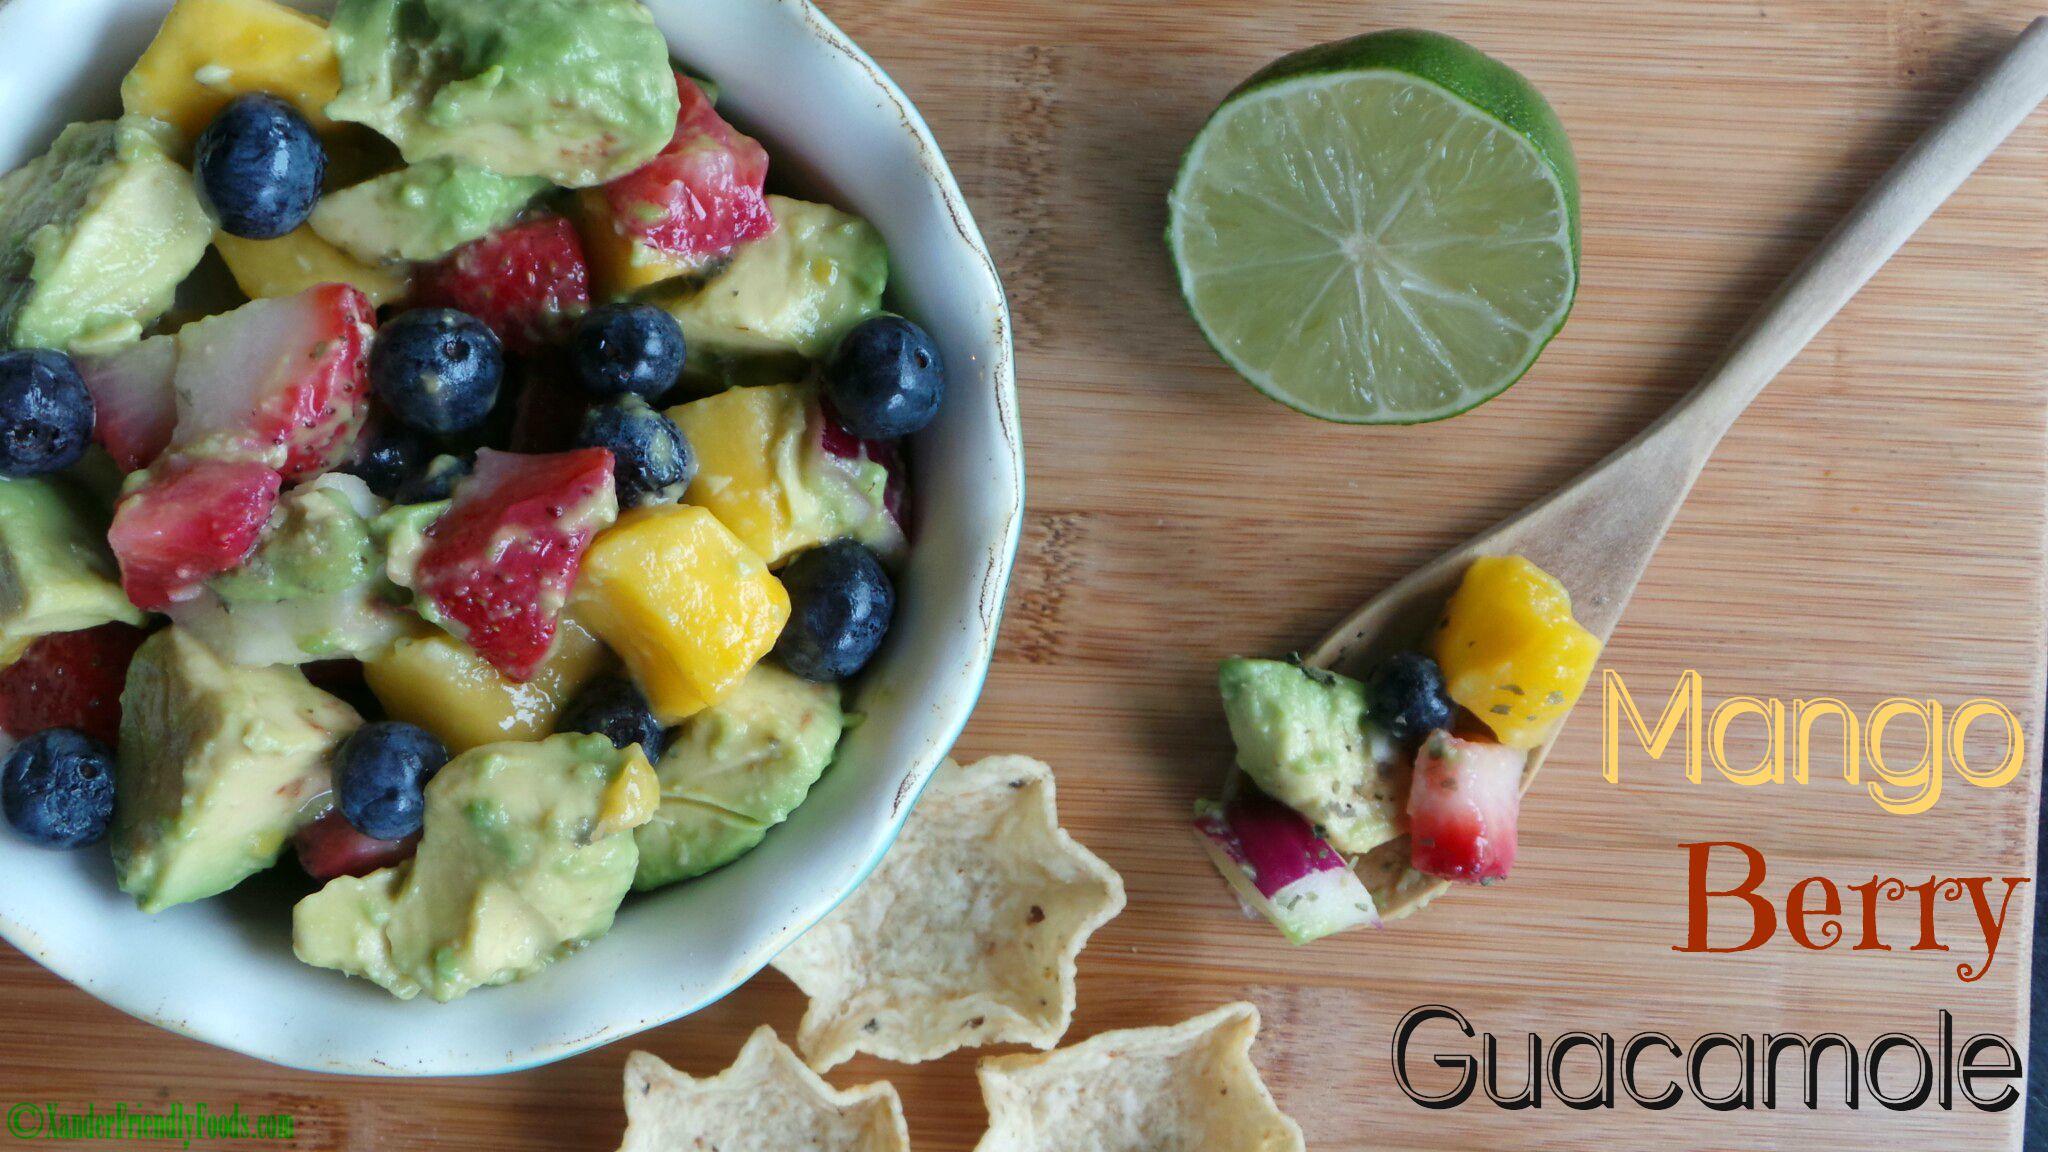 Mango Berry Guac